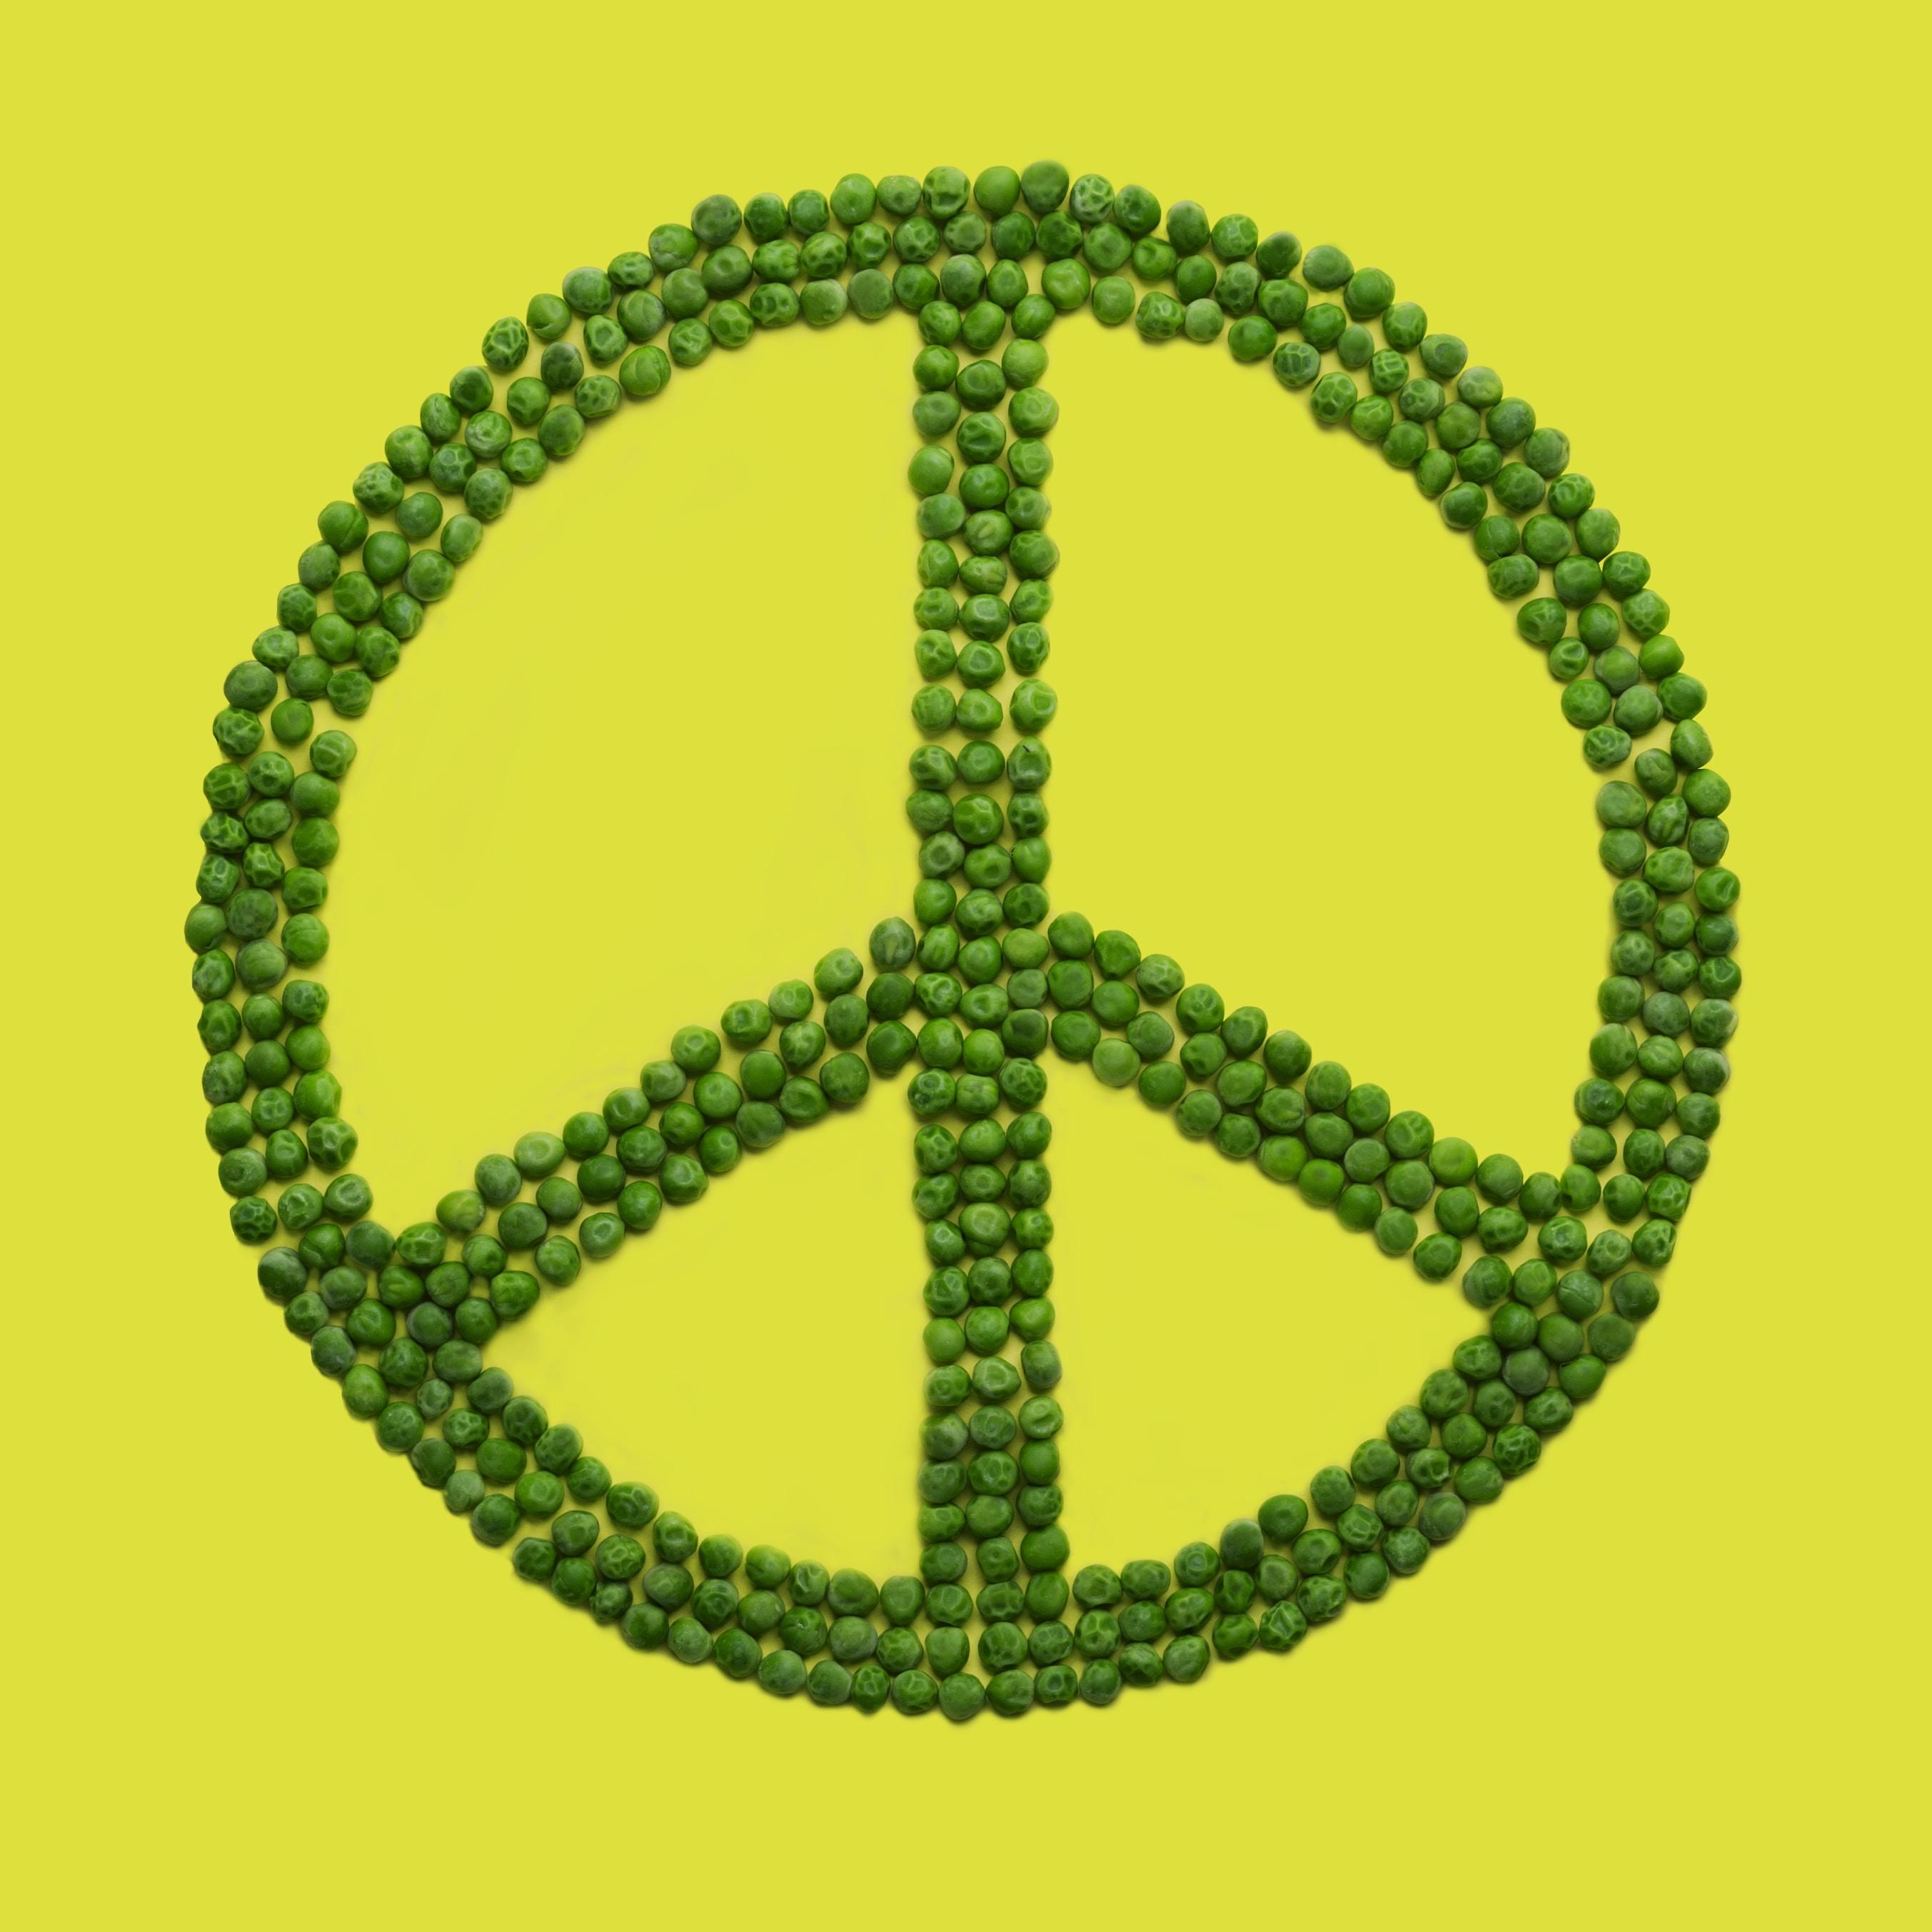 green peas peace sign